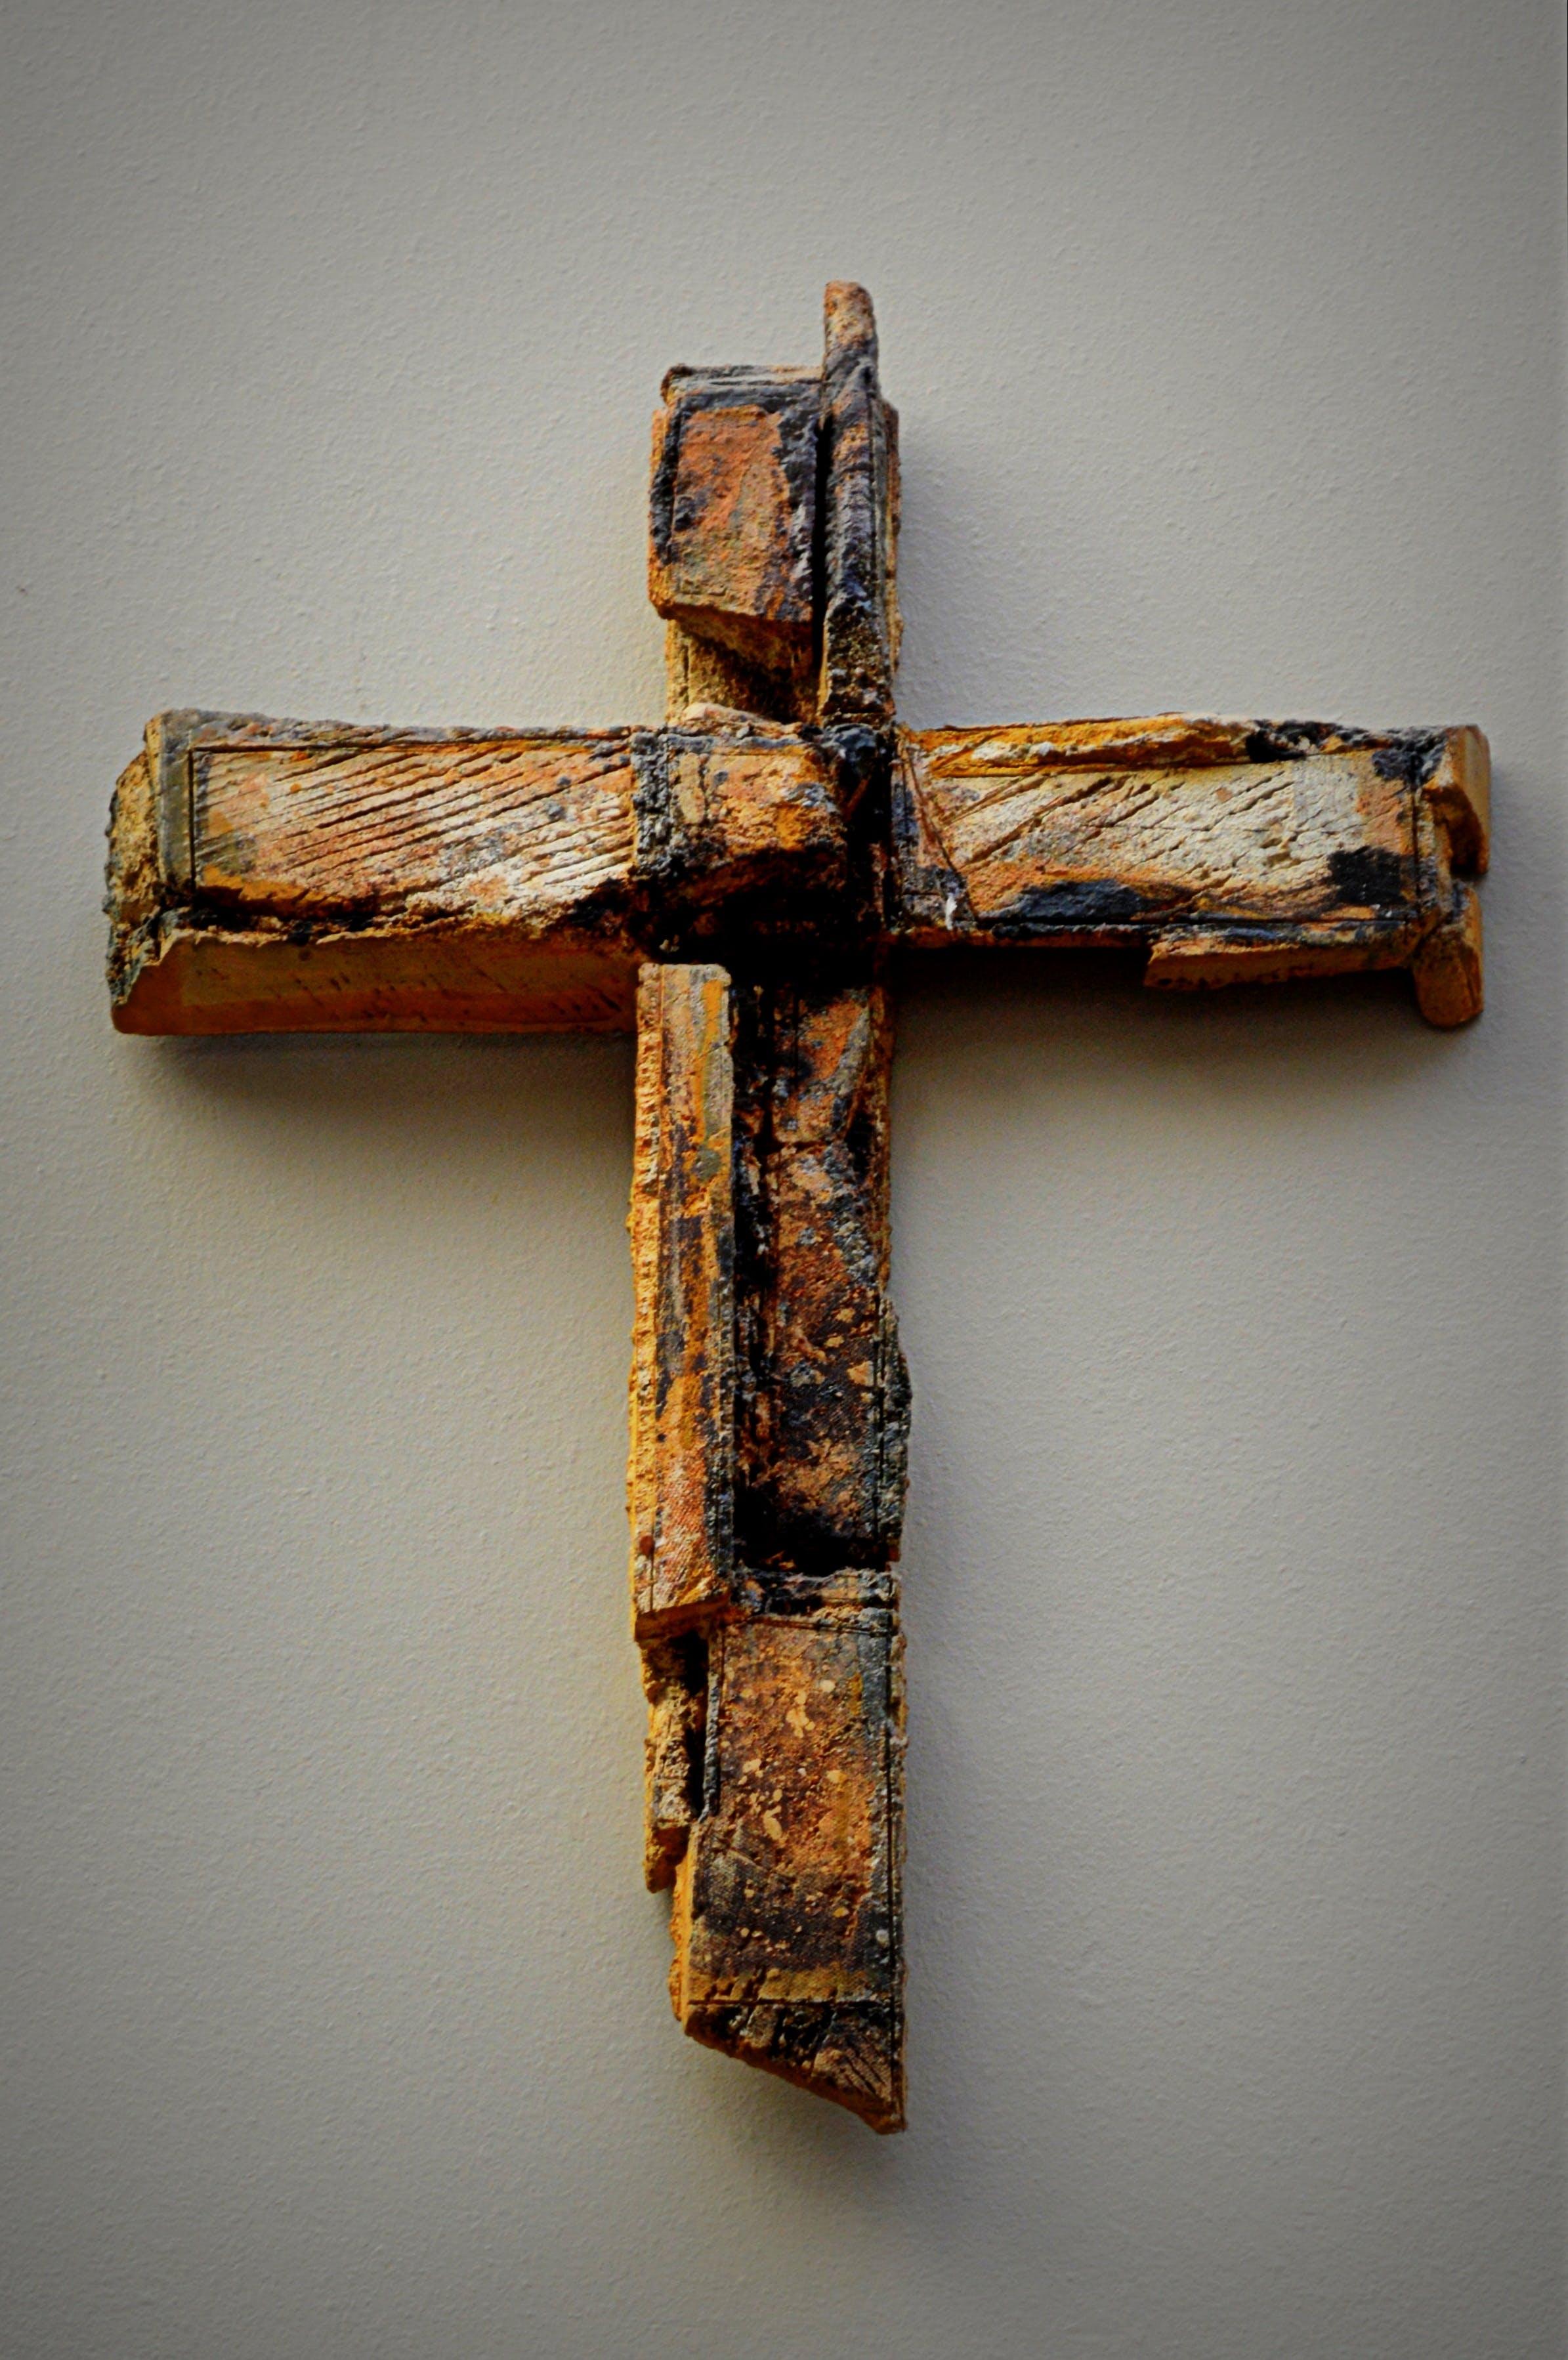 Rusty Metal on Cross Against Wall